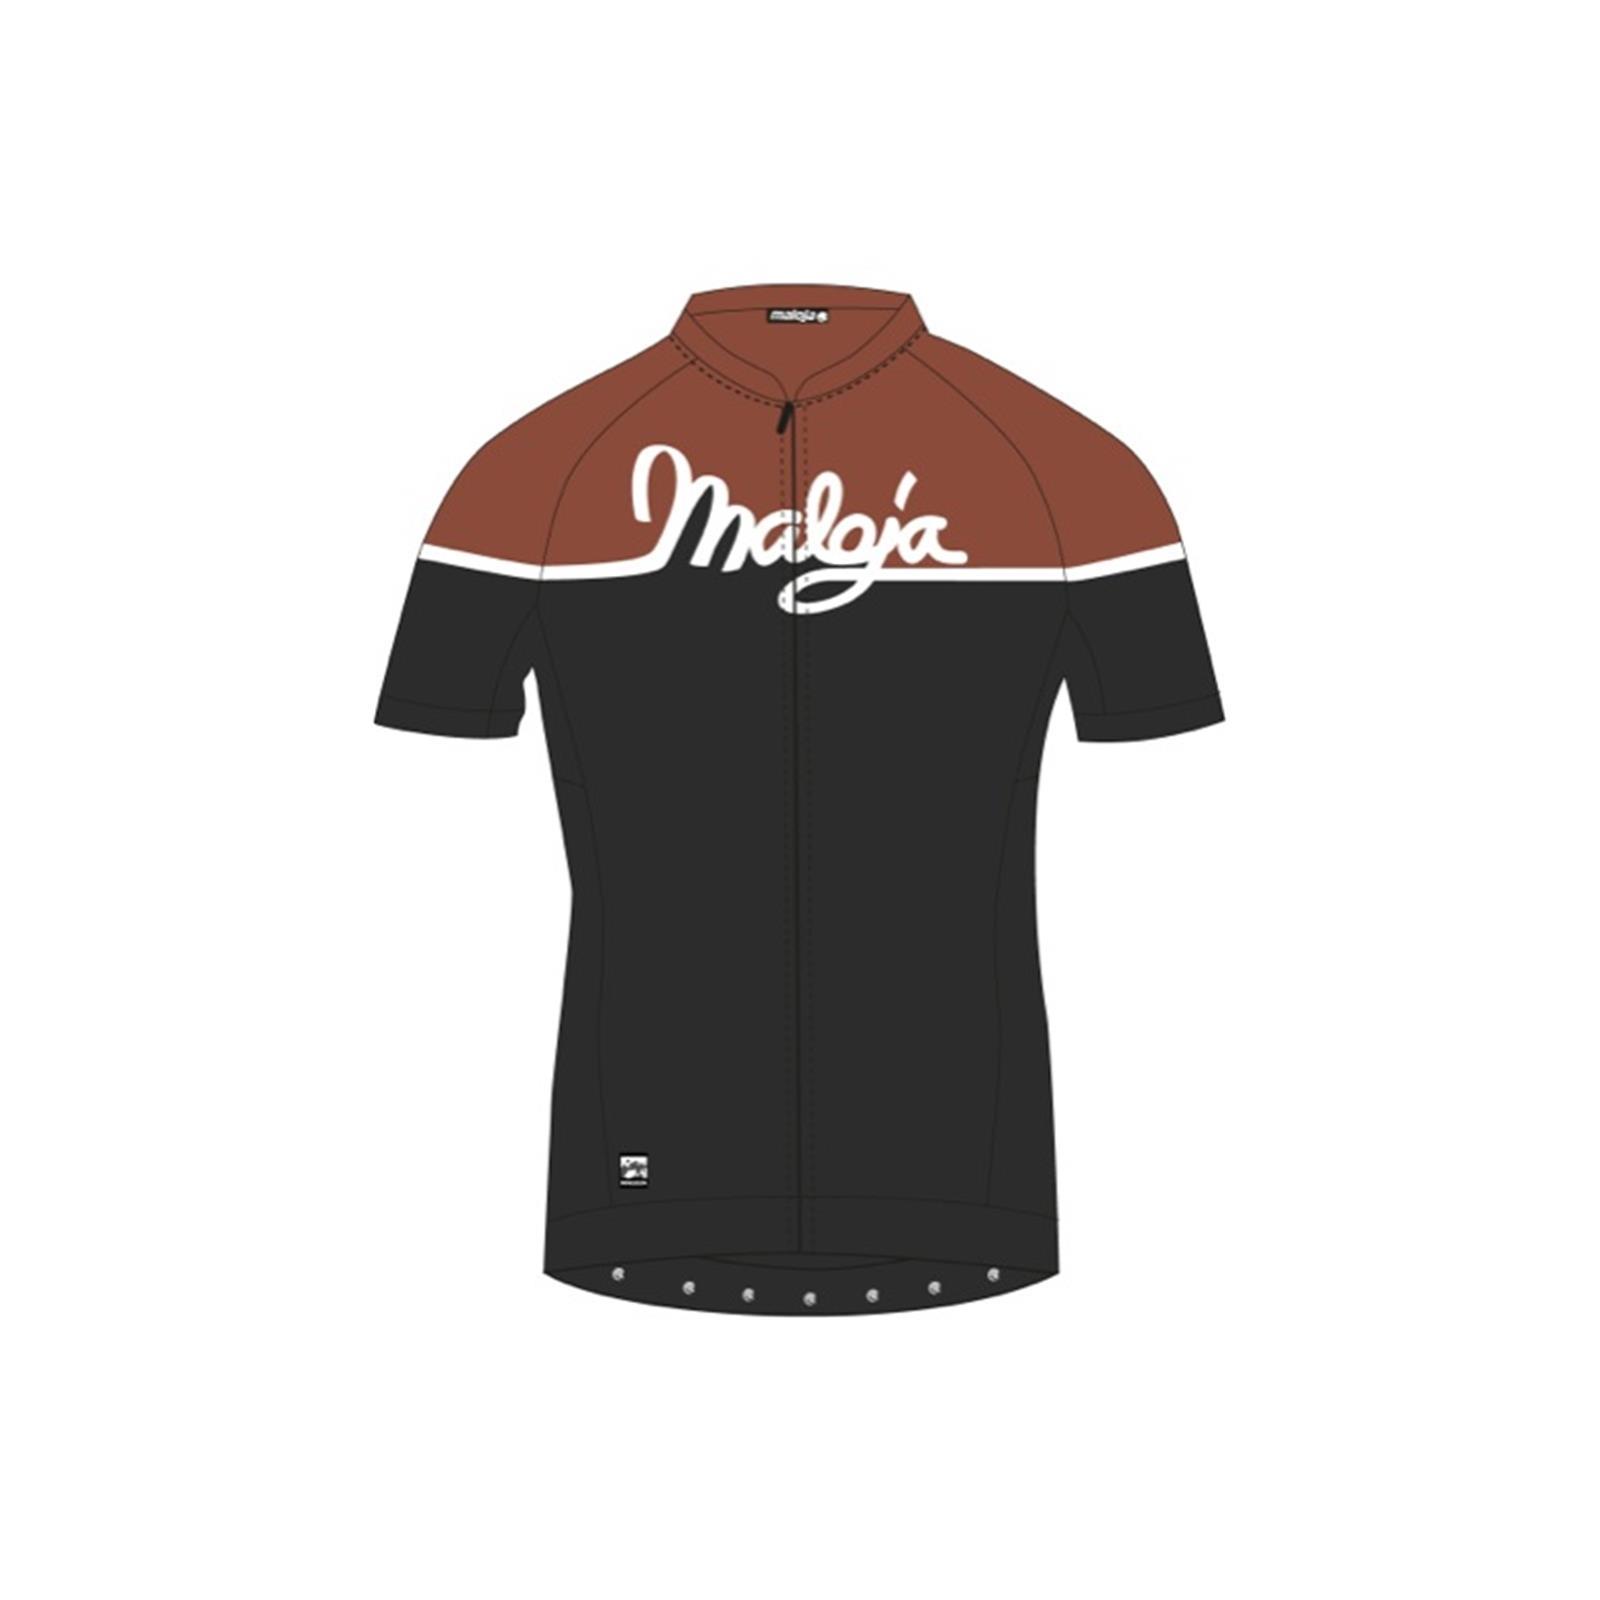 maloja rihlam 1 2 damen rad trikot granat bike shirt fahrradtrikot jersey neu ebay. Black Bedroom Furniture Sets. Home Design Ideas